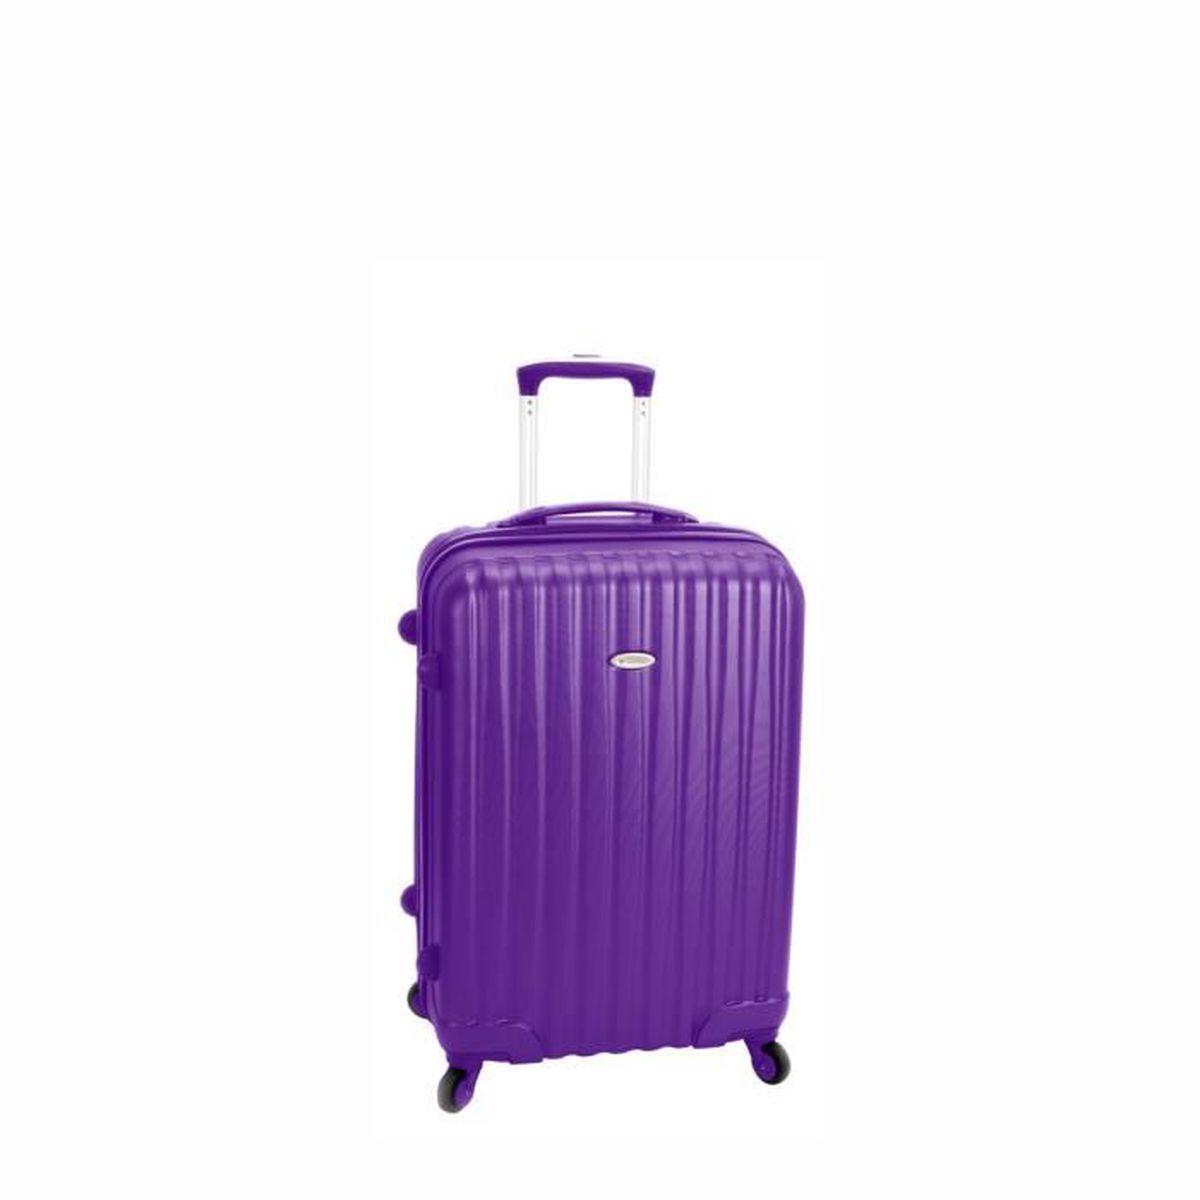 valise cabine originale achat vente valise cabine originale pas cher cdiscount. Black Bedroom Furniture Sets. Home Design Ideas